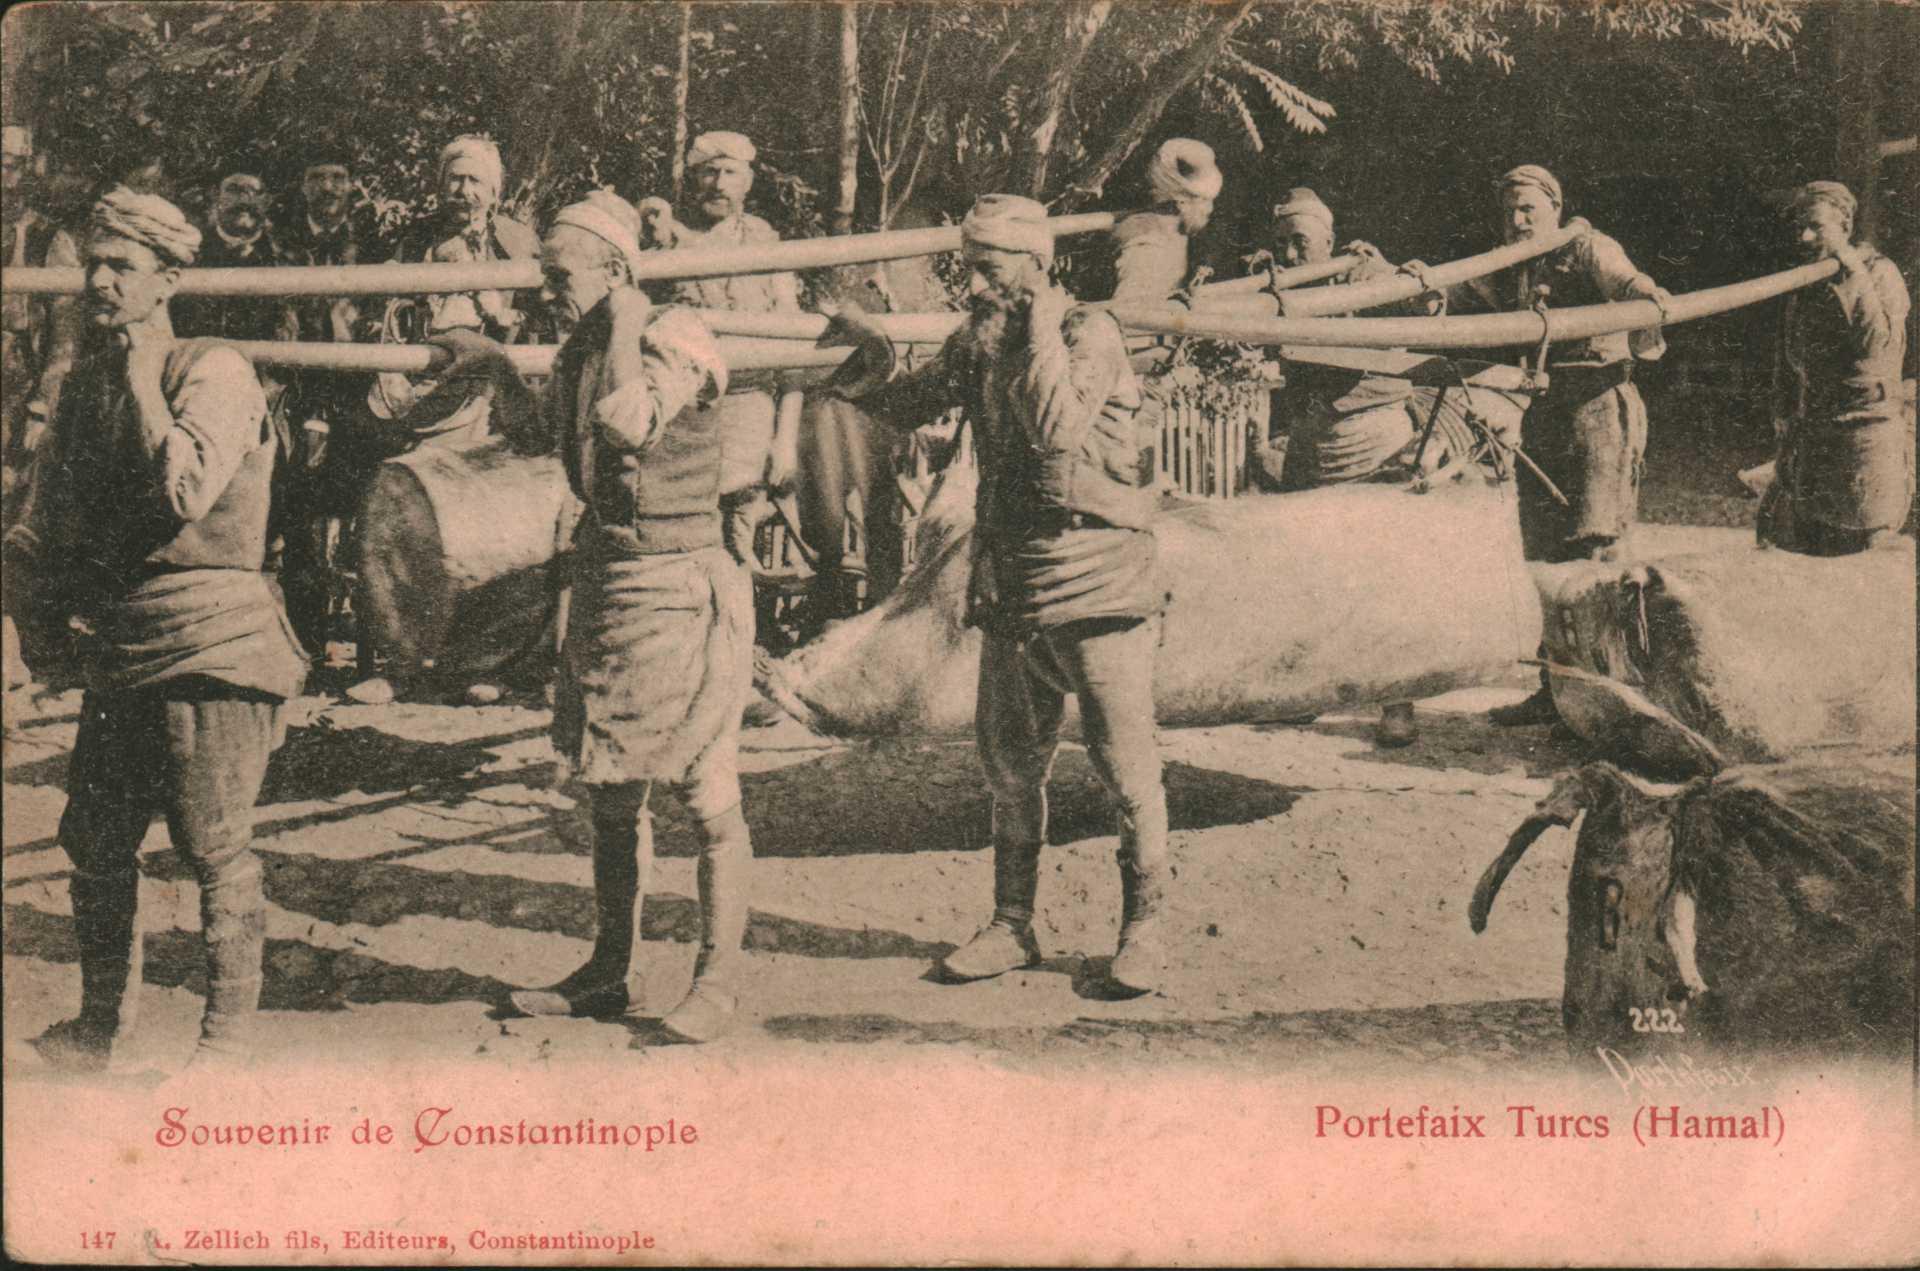 Souvenır De Constantinople-Portefaix turcs (Hamal)